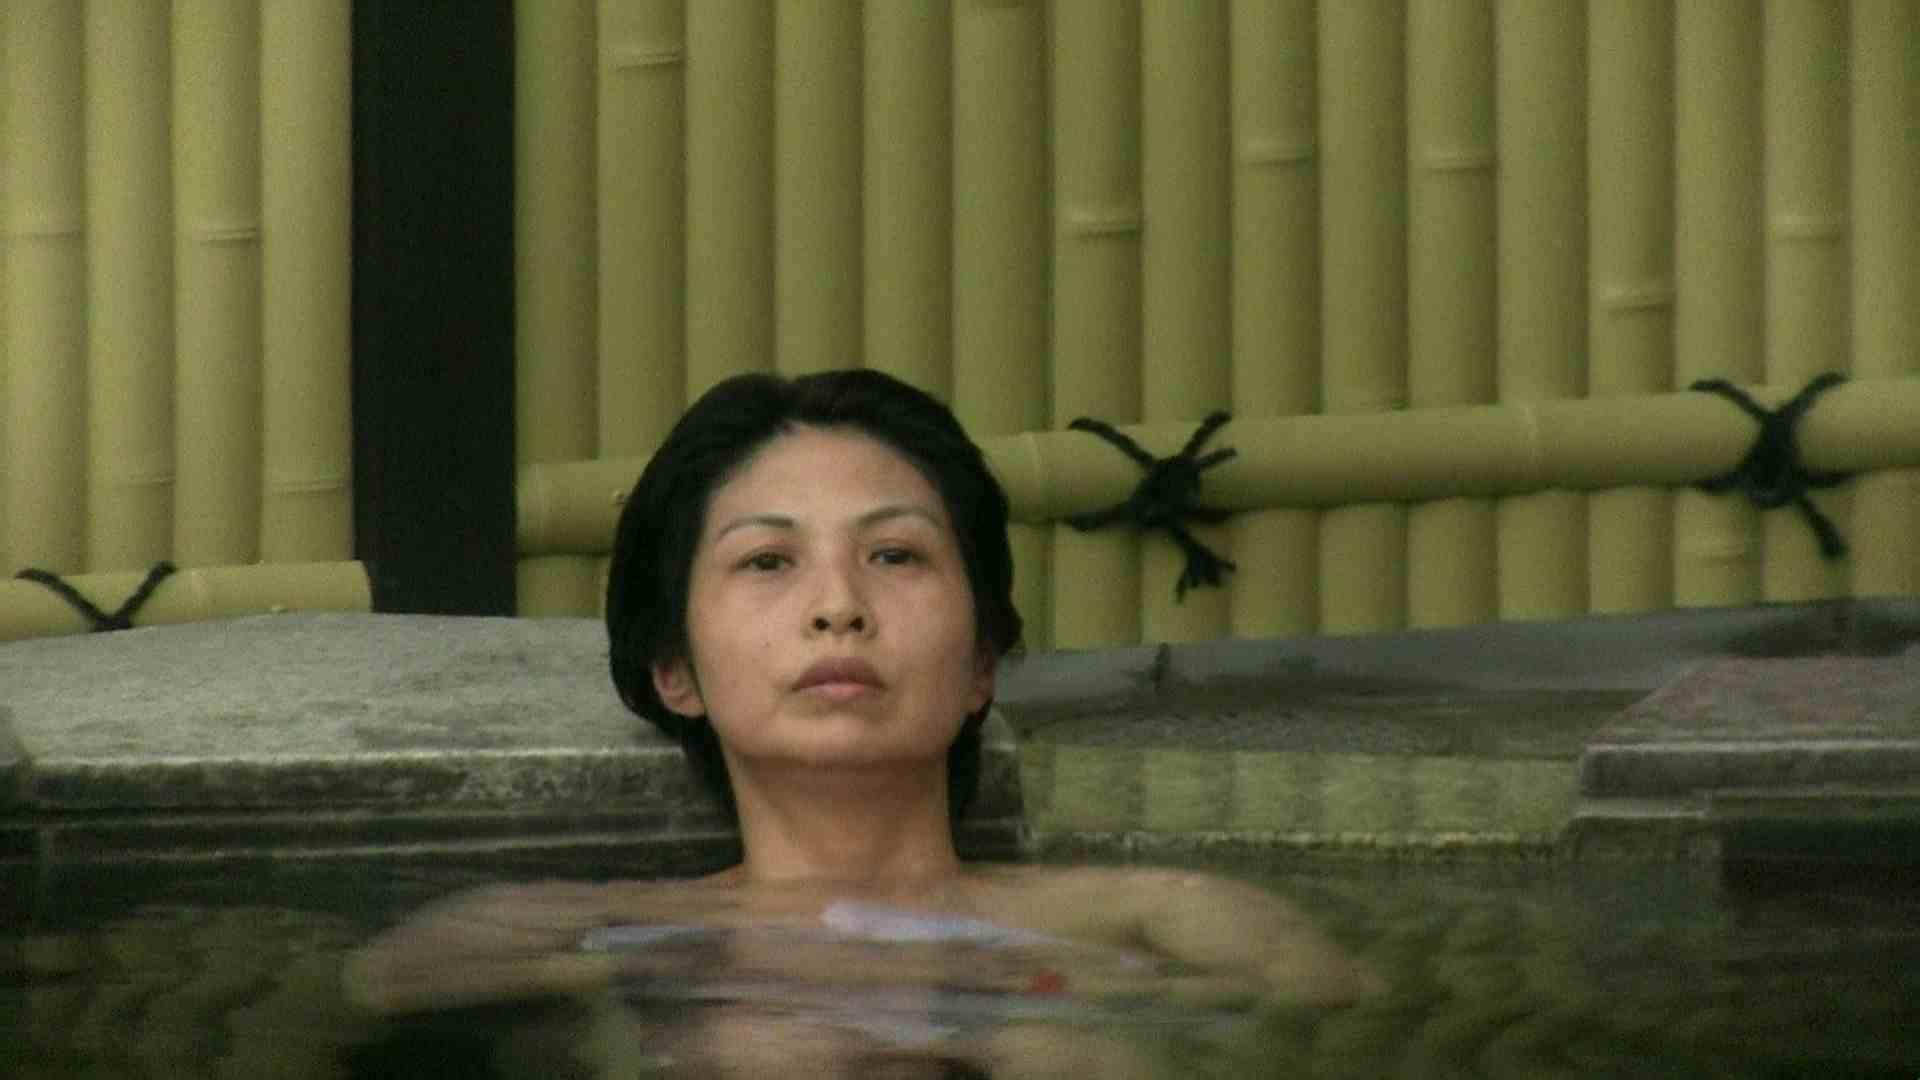 Aquaな露天風呂Vol.636 女体盗撮 盗み撮りSEX無修正画像 87連発 26